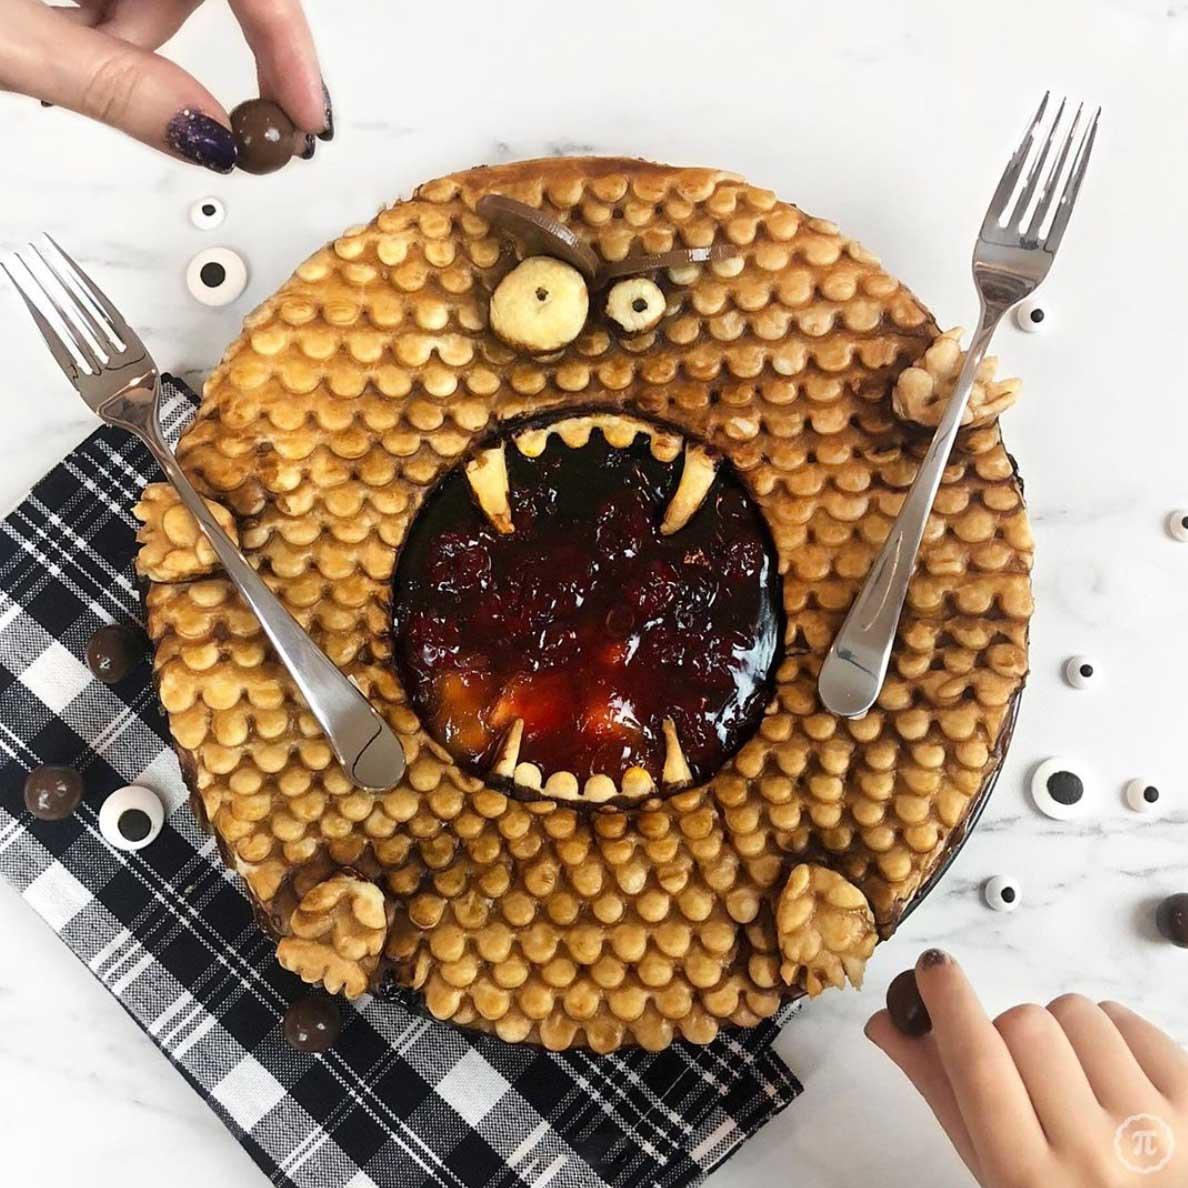 Kreative Kuchenkunst von Jessica Clark-Bojin piesareawesome-Jessica-Clark-Bojin_12